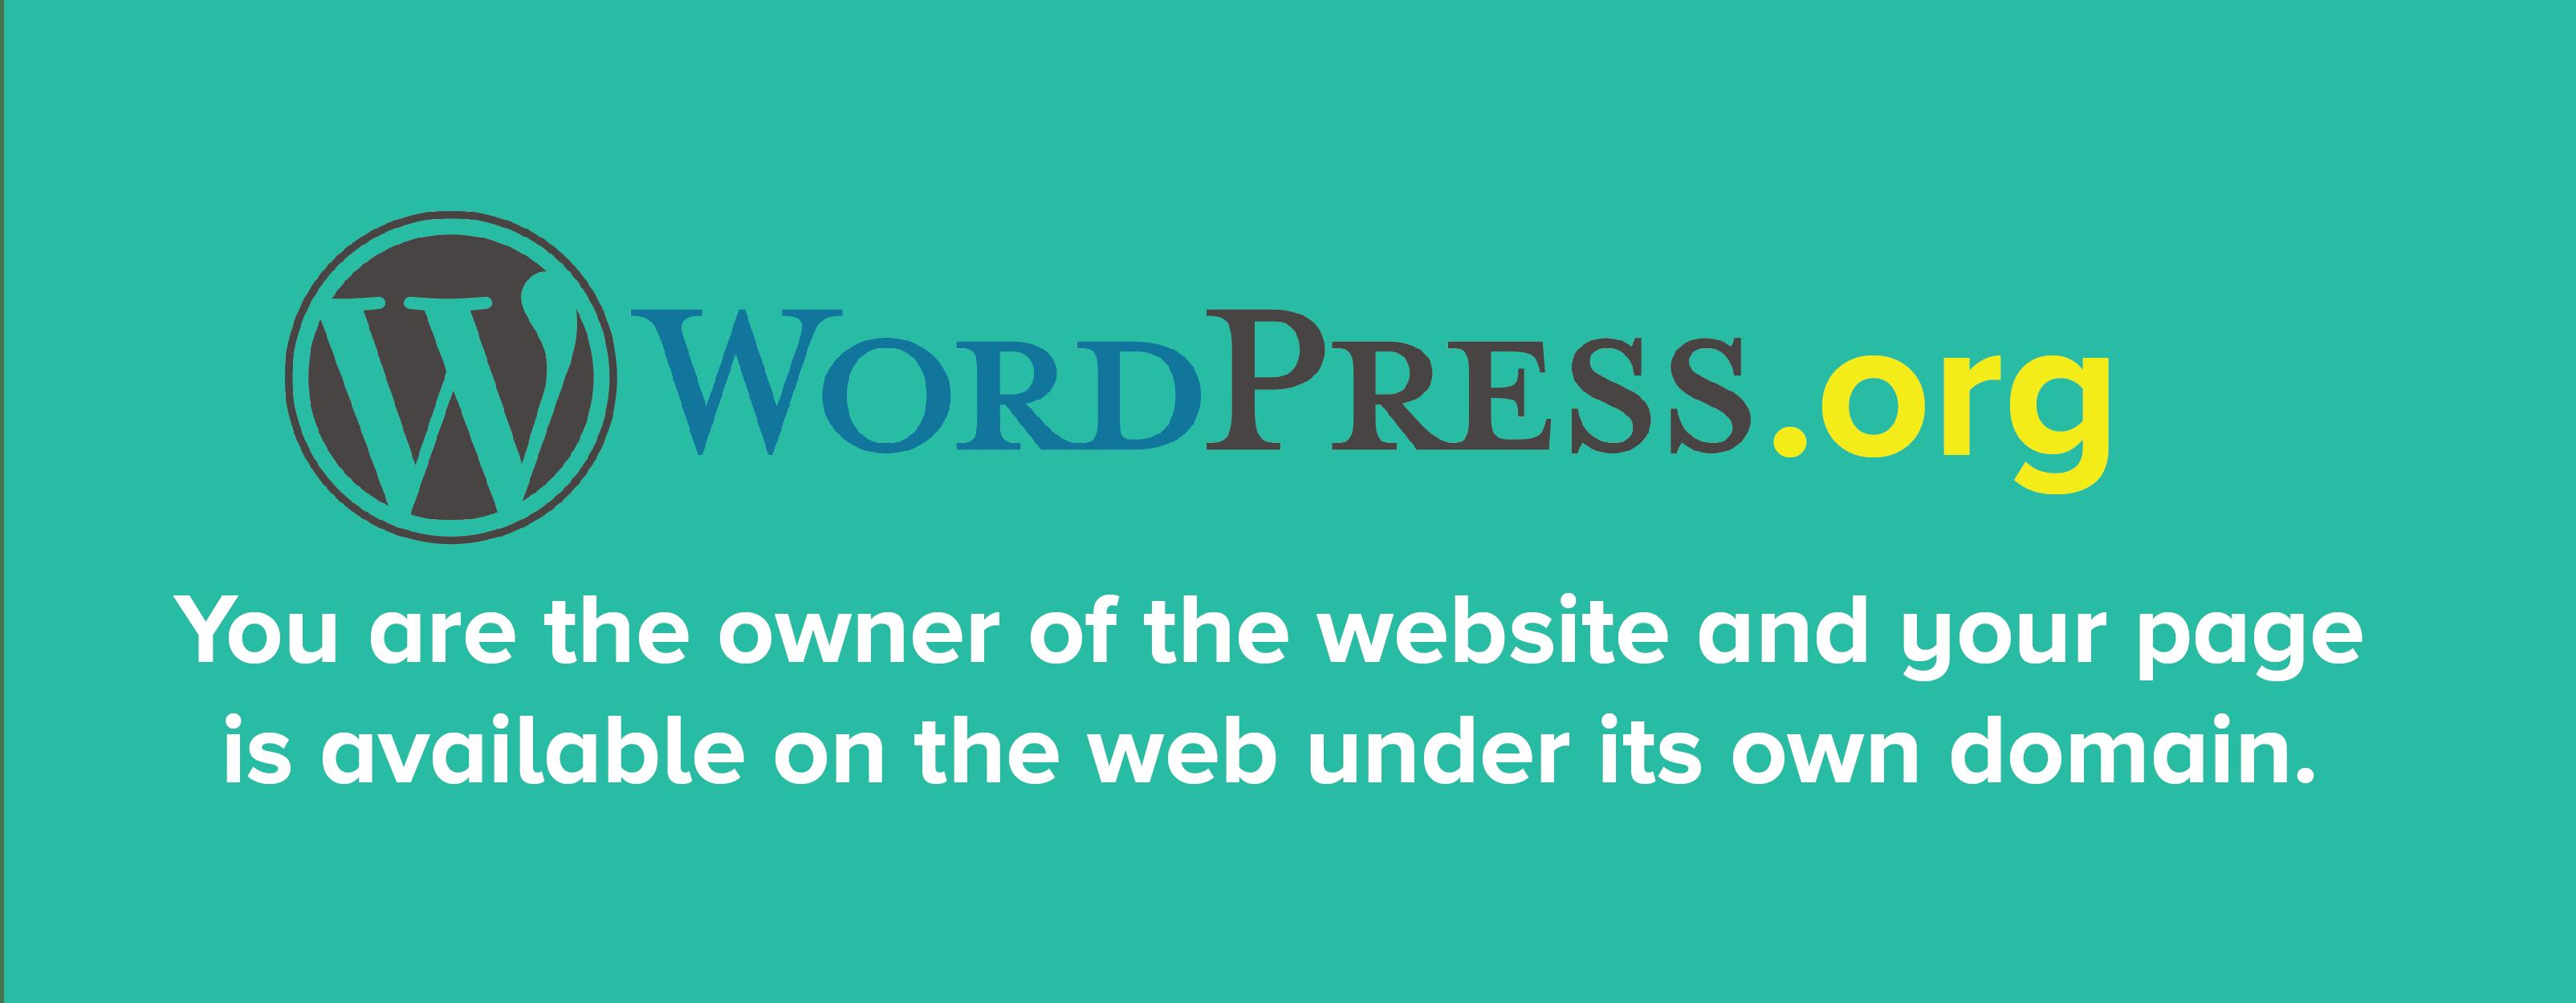 wordpress.org advantages